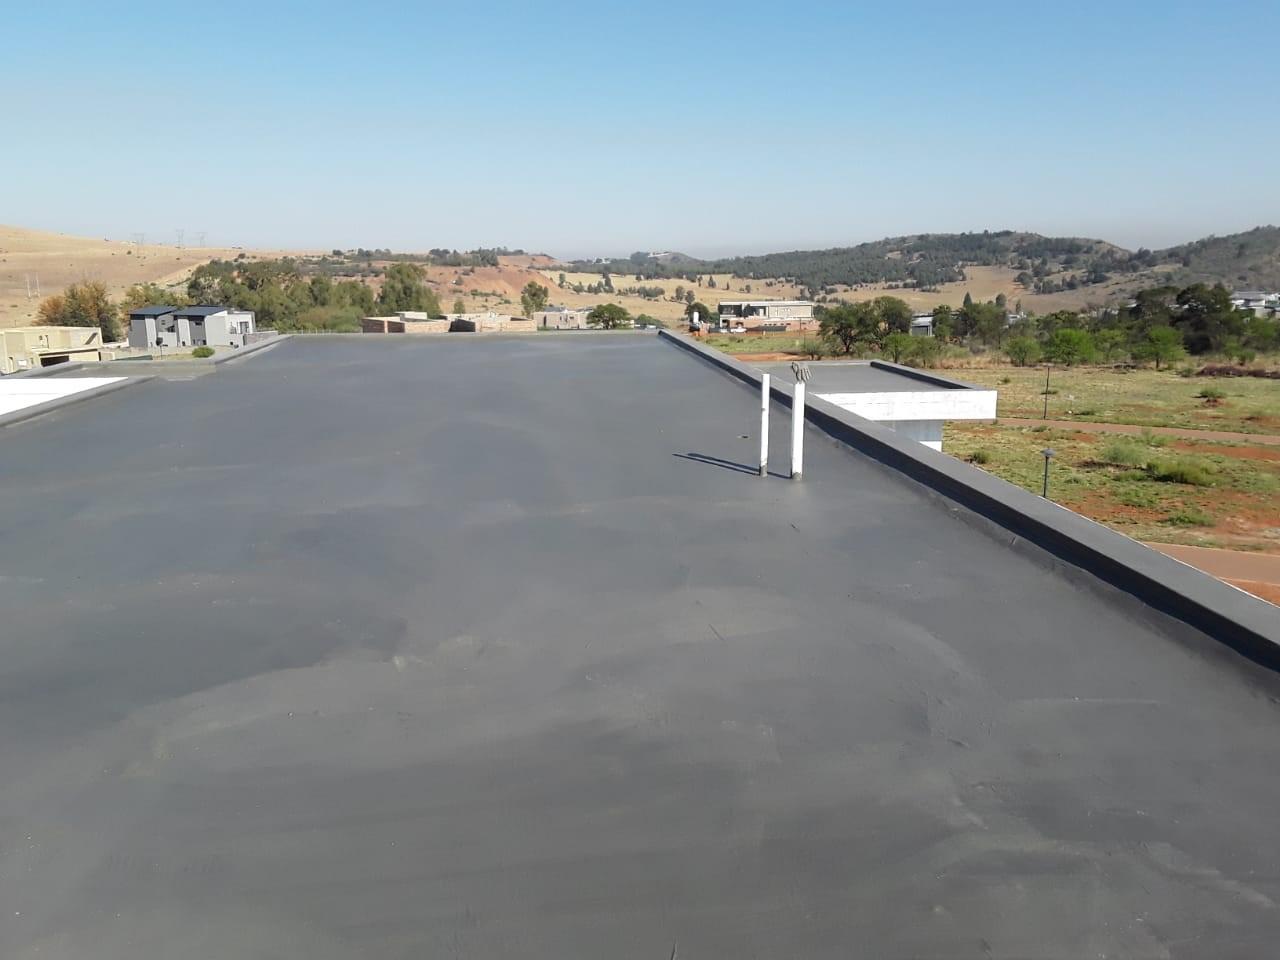 Tar Roads using sub-layered Insitu Materials - Dust Suppression